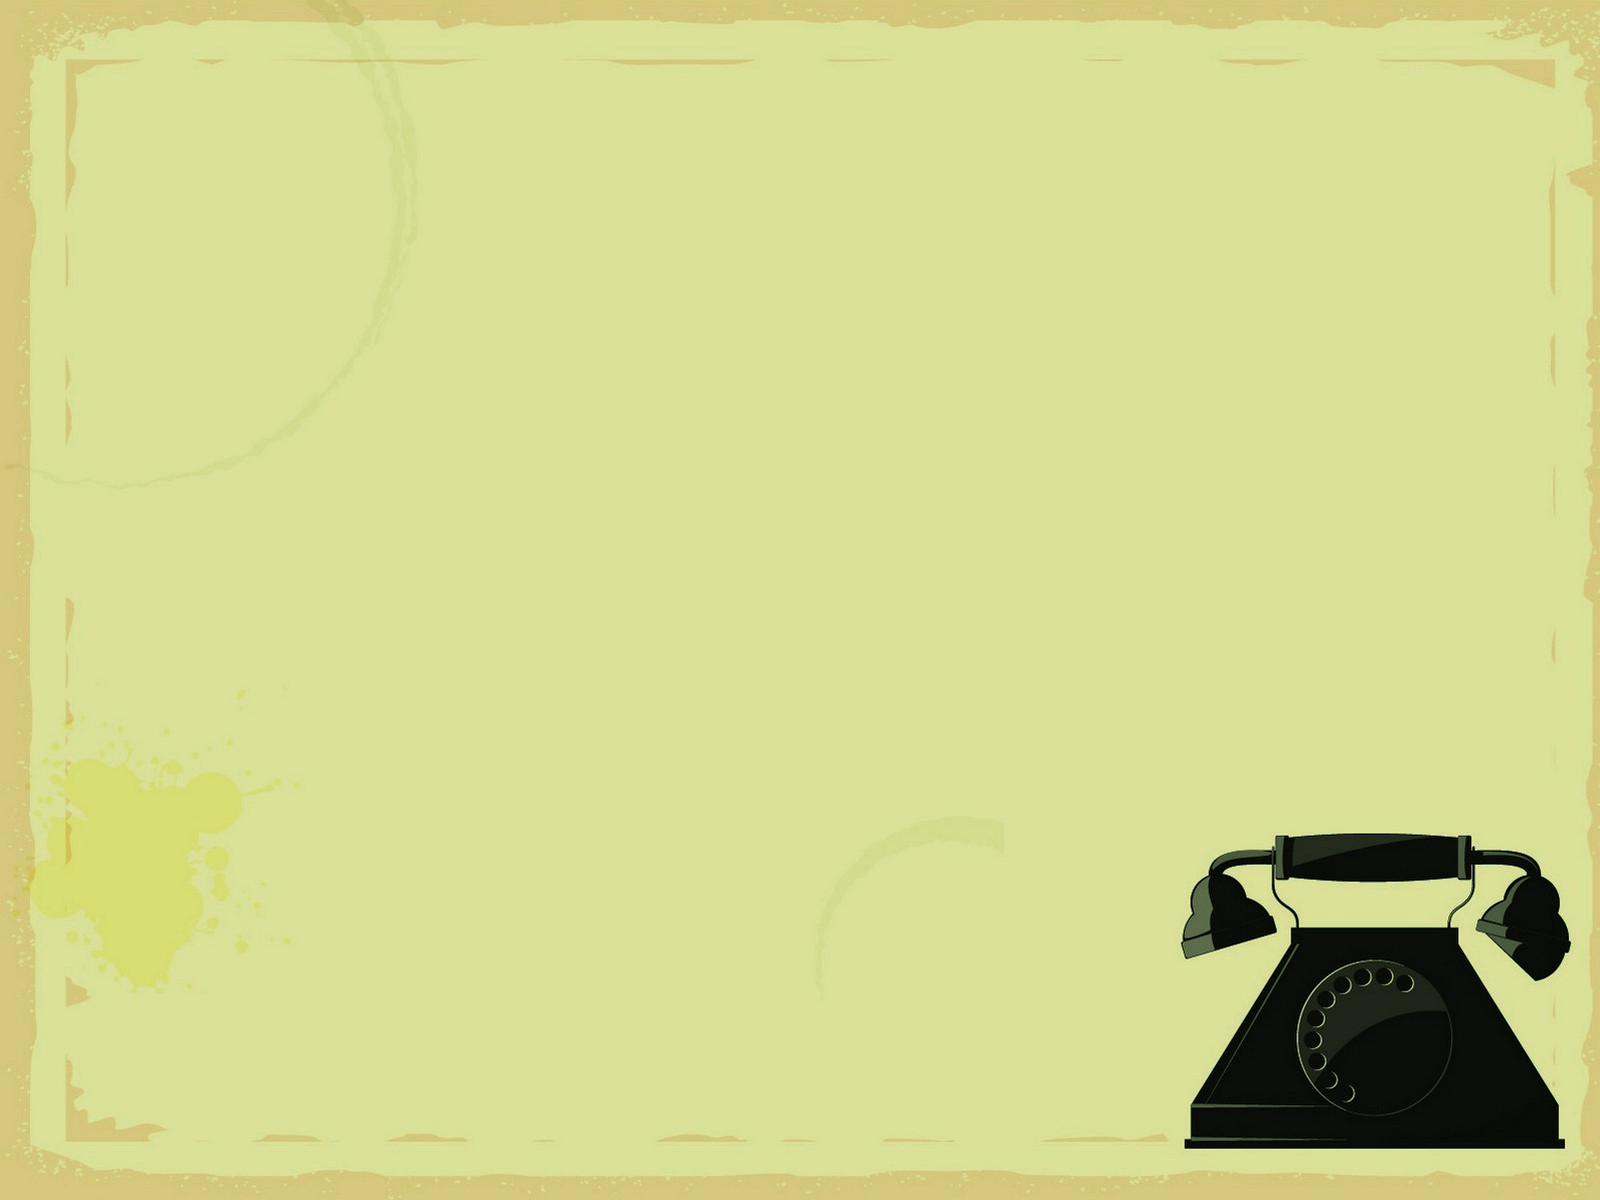 Black Telephone PPT Backgrounds